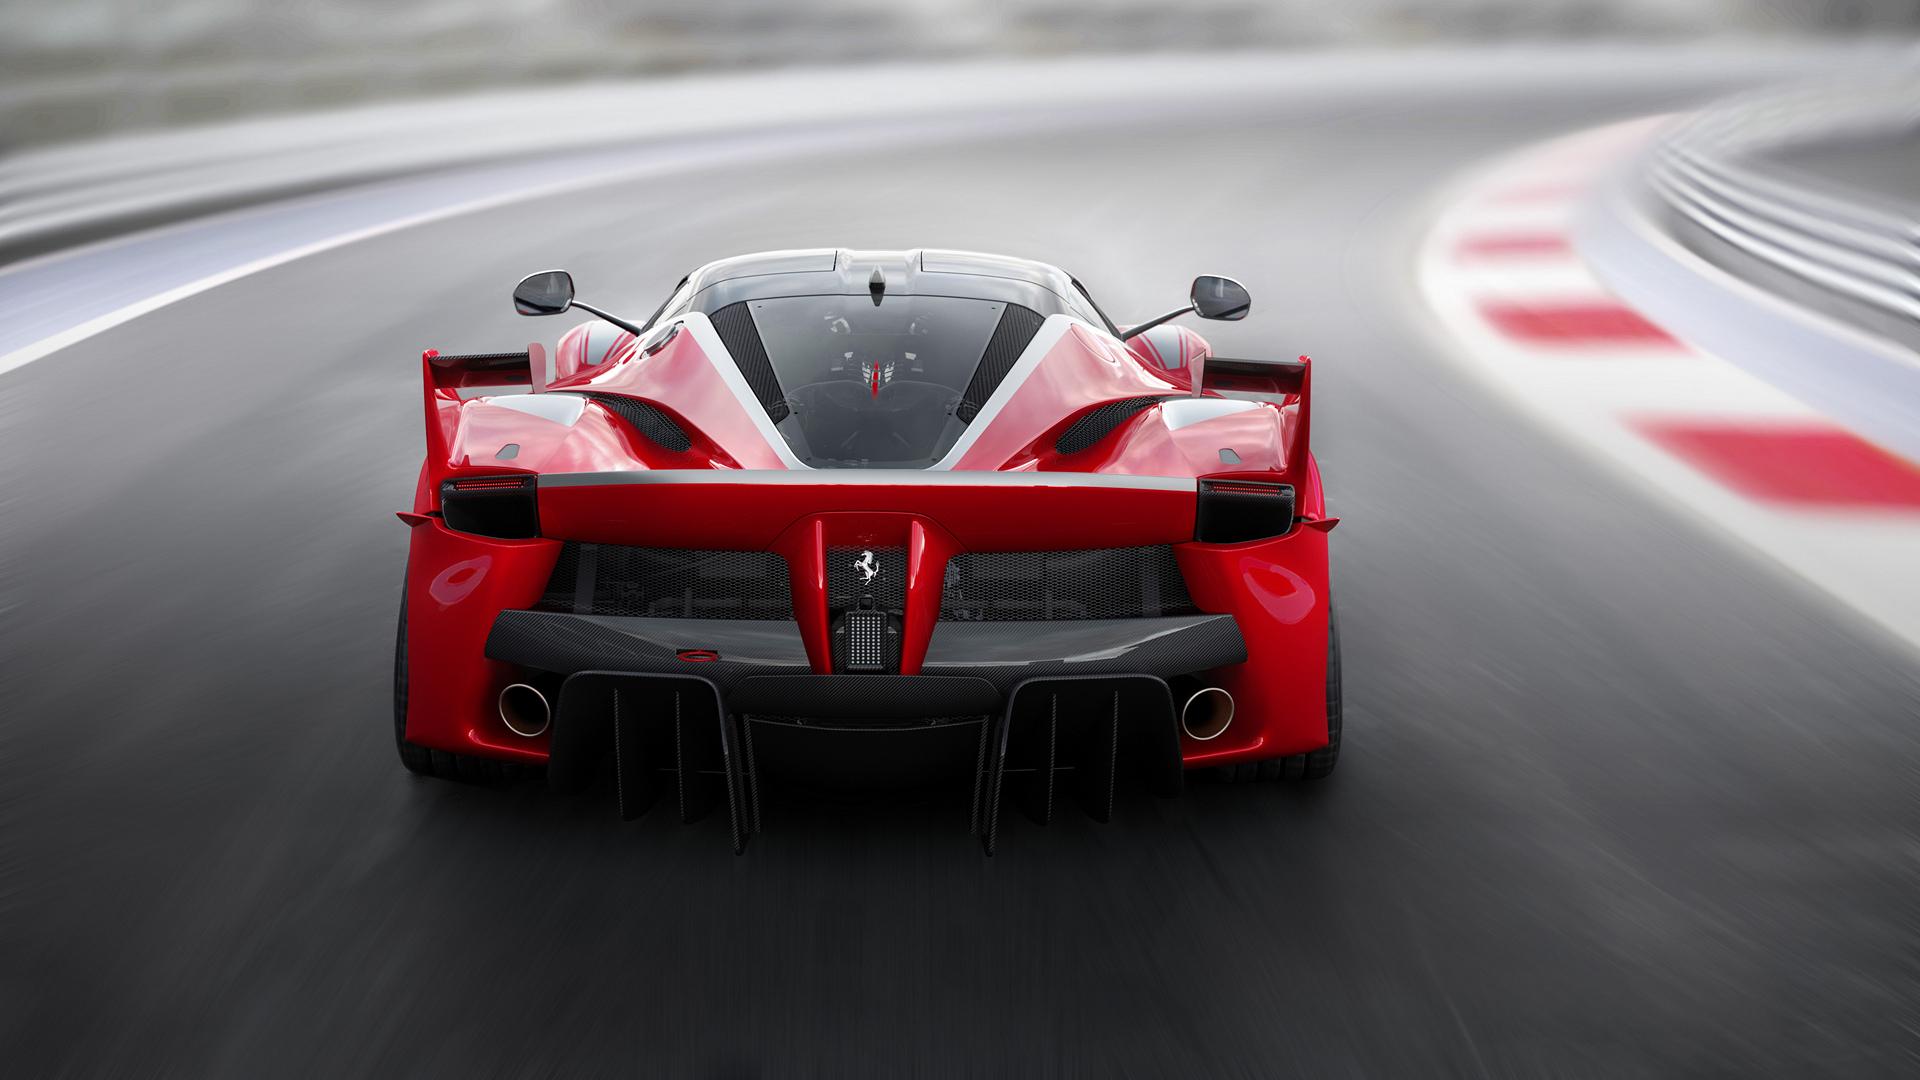 Ferrari FXX K © Ferrari S.p.A.